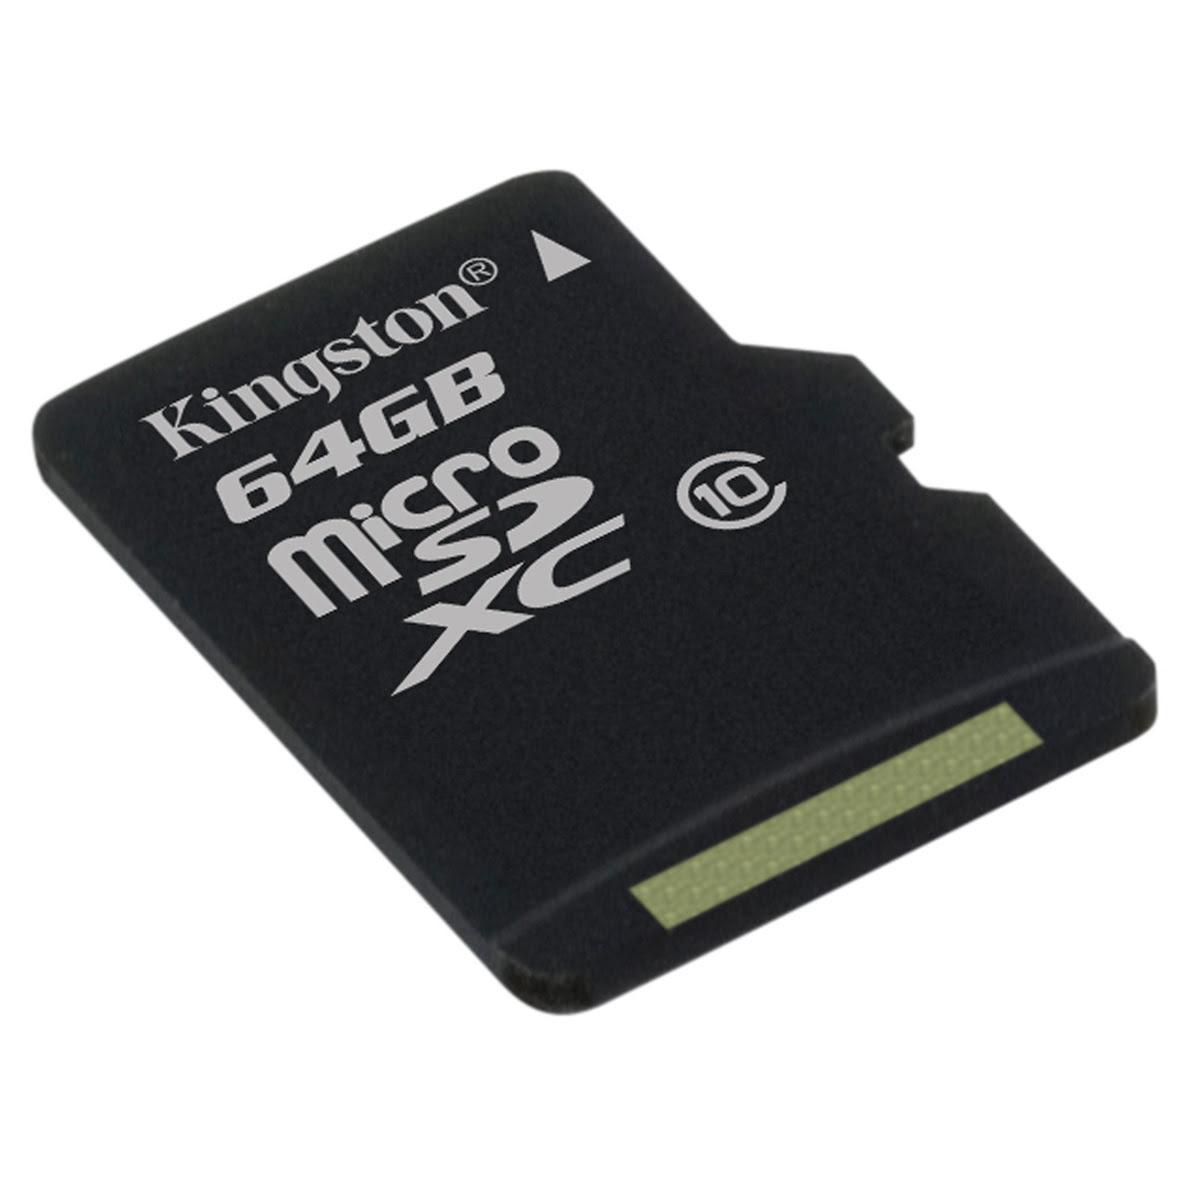 Kingston Micro SDHC 64Go Class 10 + Adapt - Carte mémoire - 0